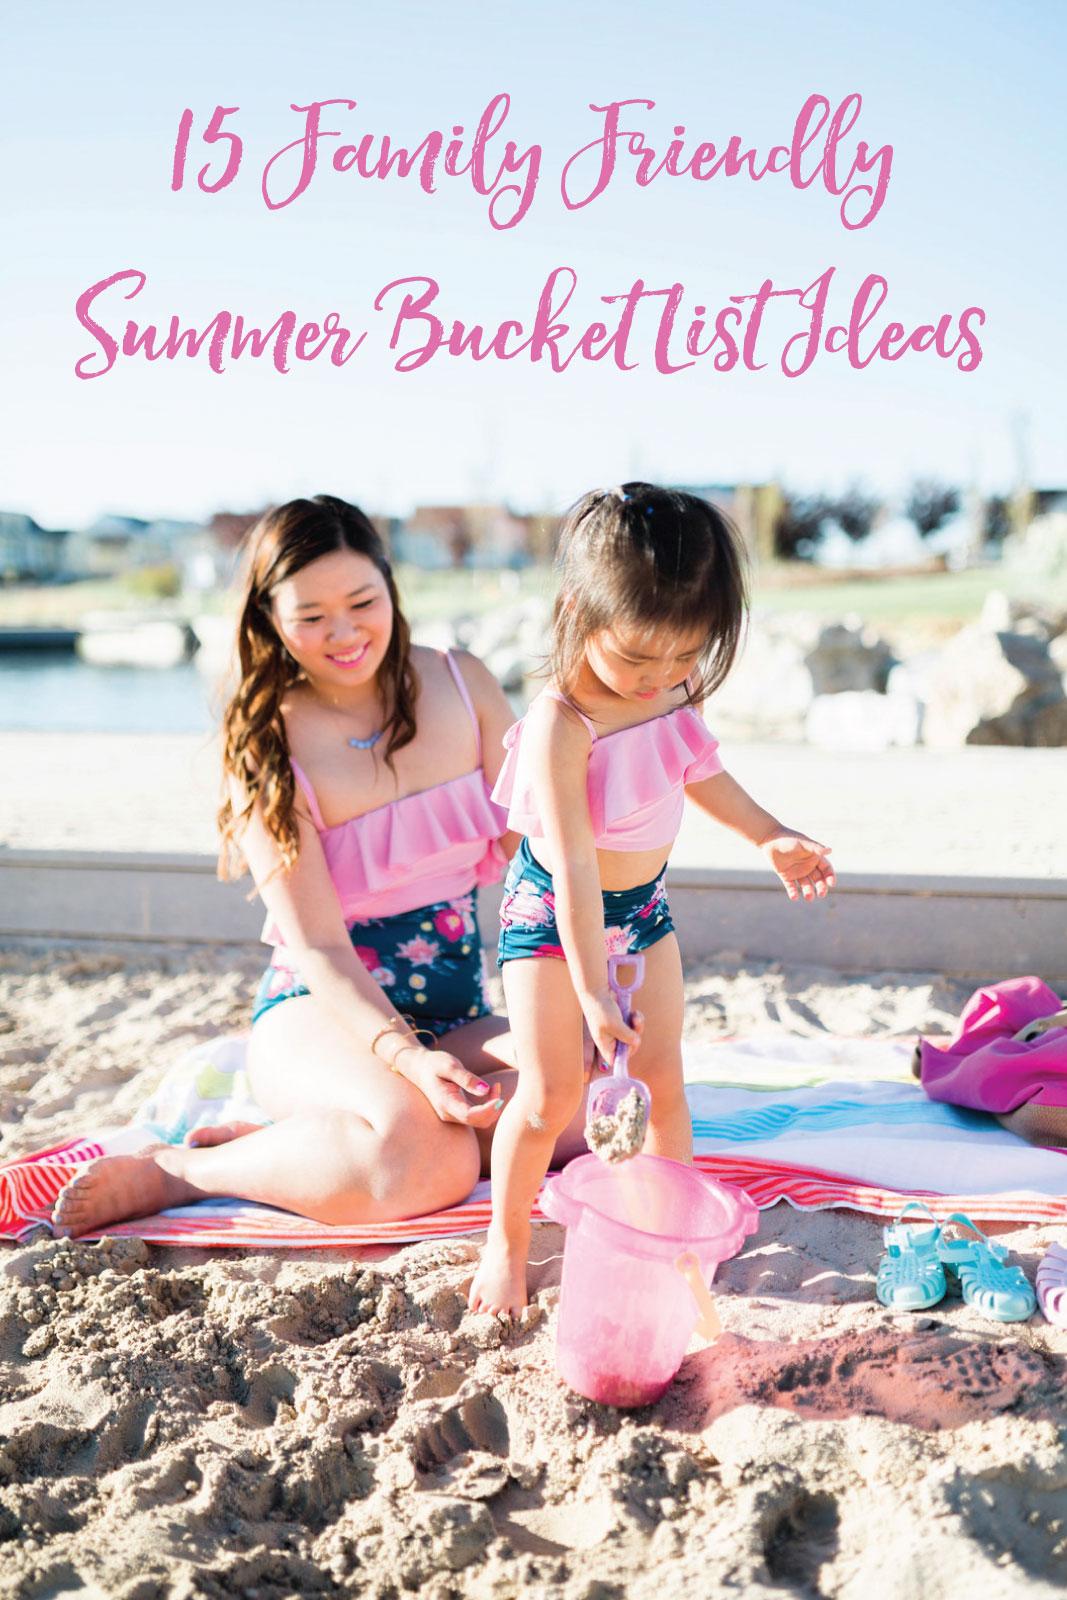 15 Fun Ideas For Your Family Summer Bucket List